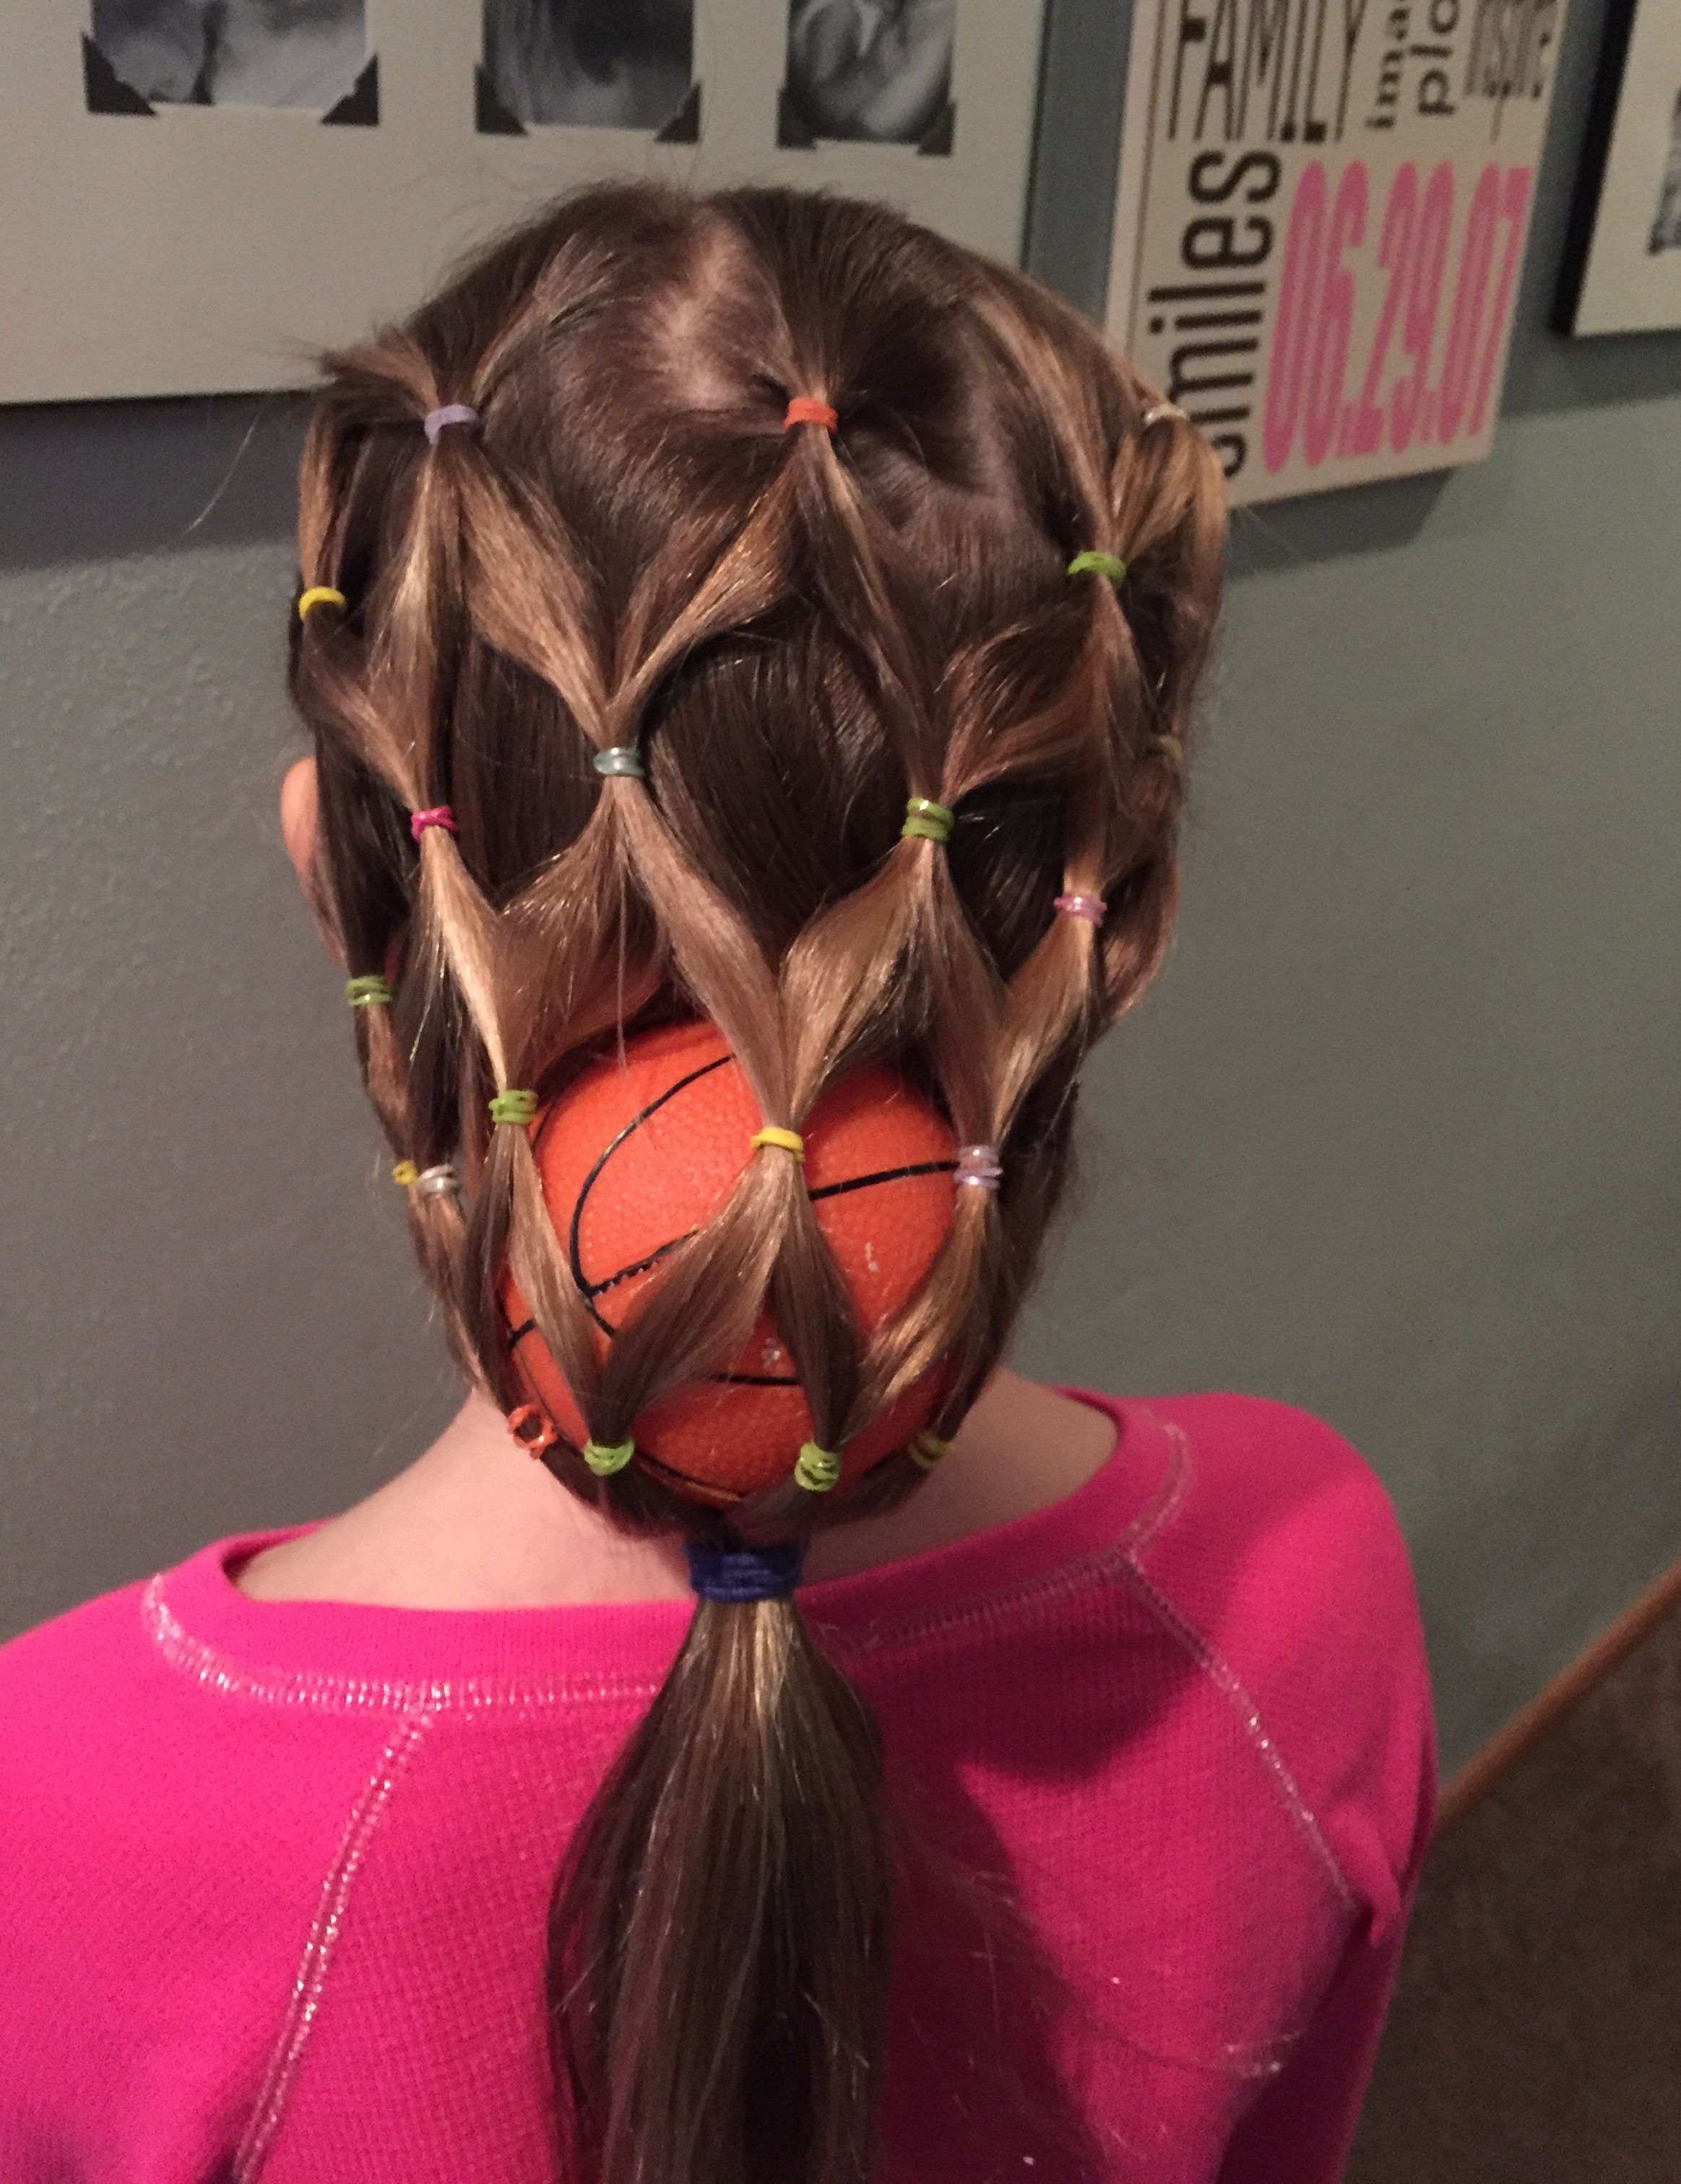 Crazy Hair Day. Basketball Net.